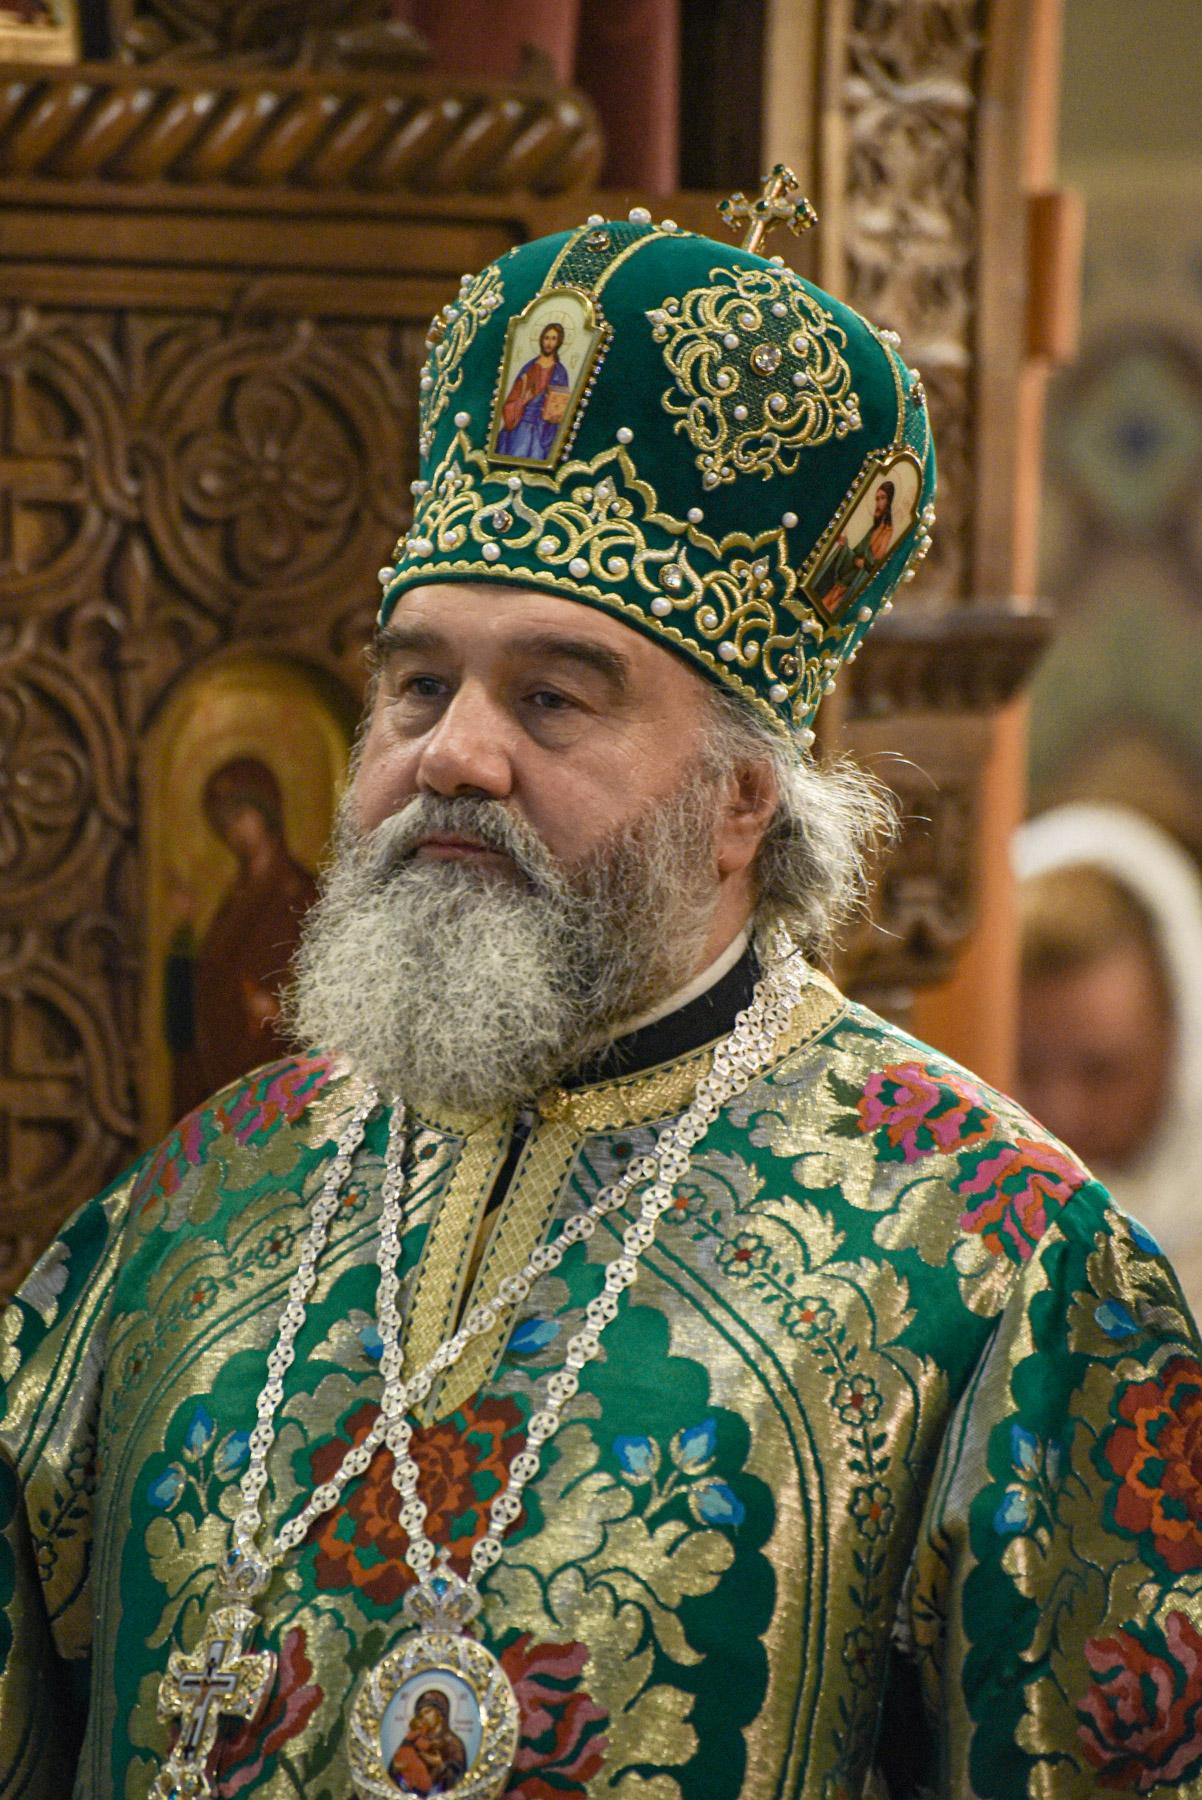 photos of orthodox christmas 0179 2